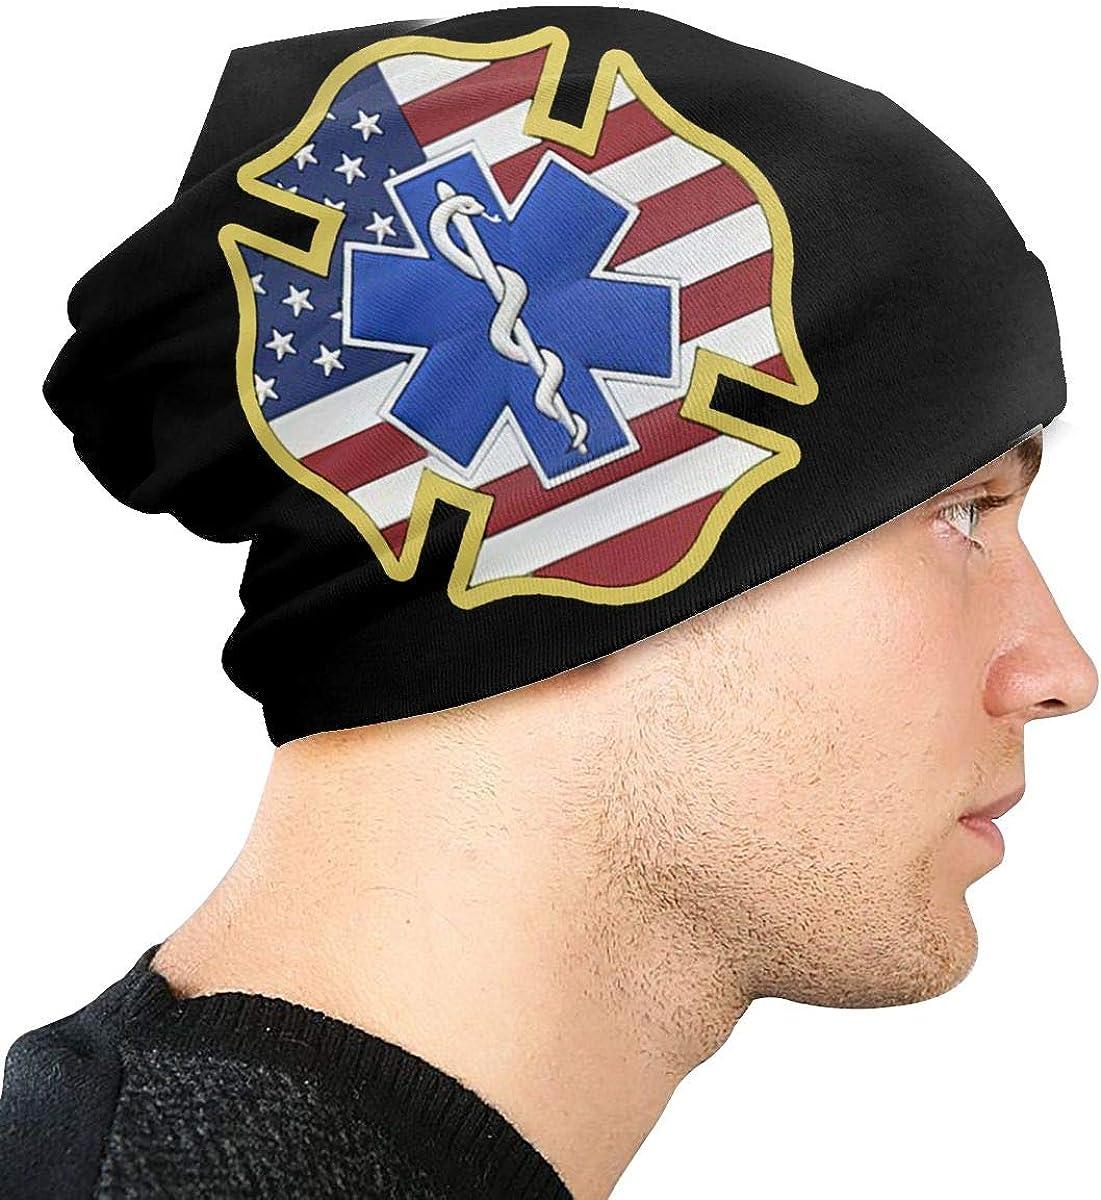 JINGUImao EMS EMT Fire Fighter USA Flag Unisex Warm Hat Knit Hat Skull Cap Beanies Cap